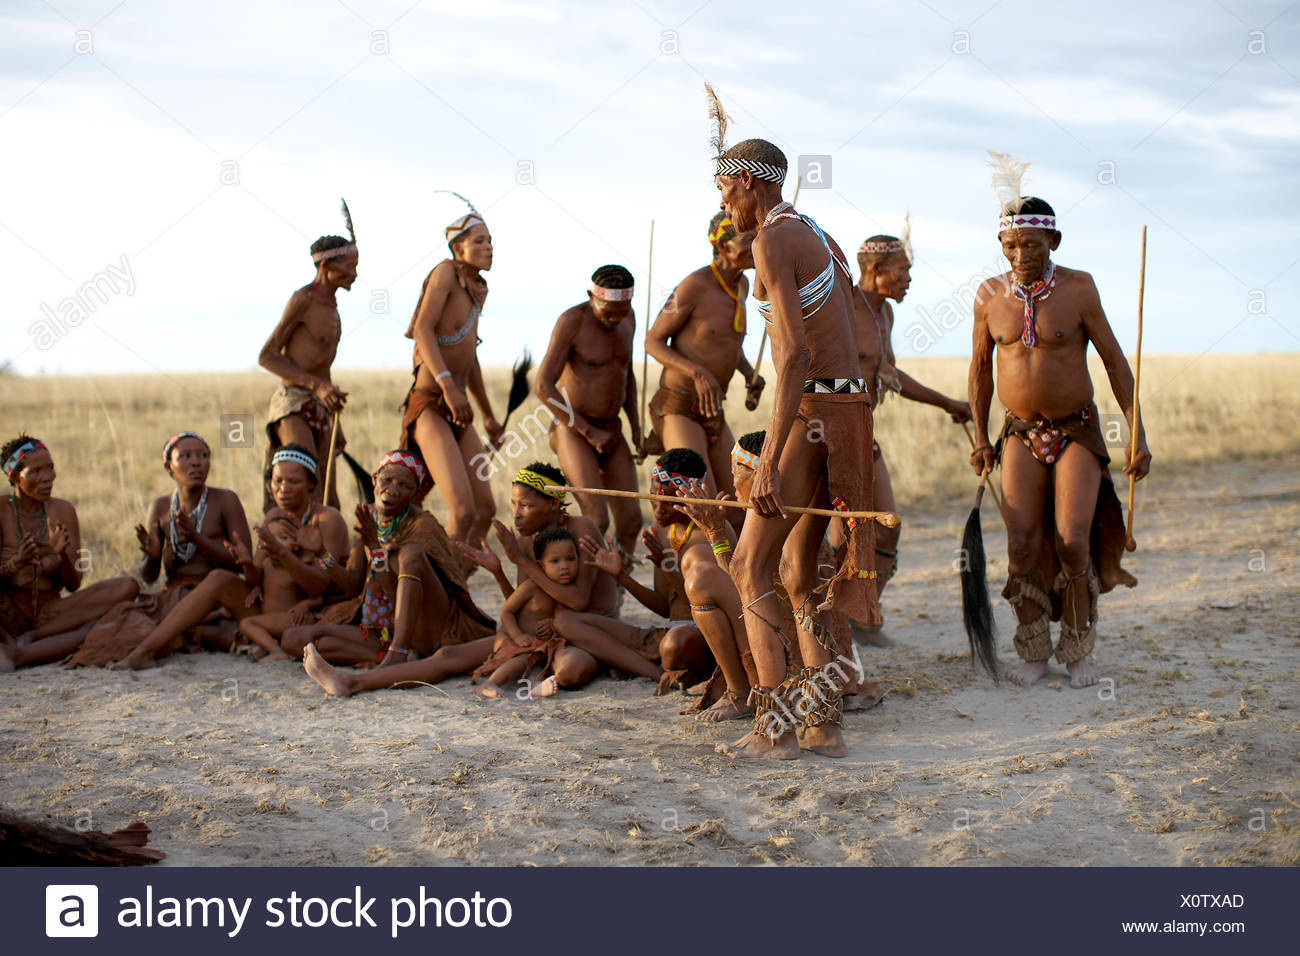 Bushmen by campfire - Stock Image